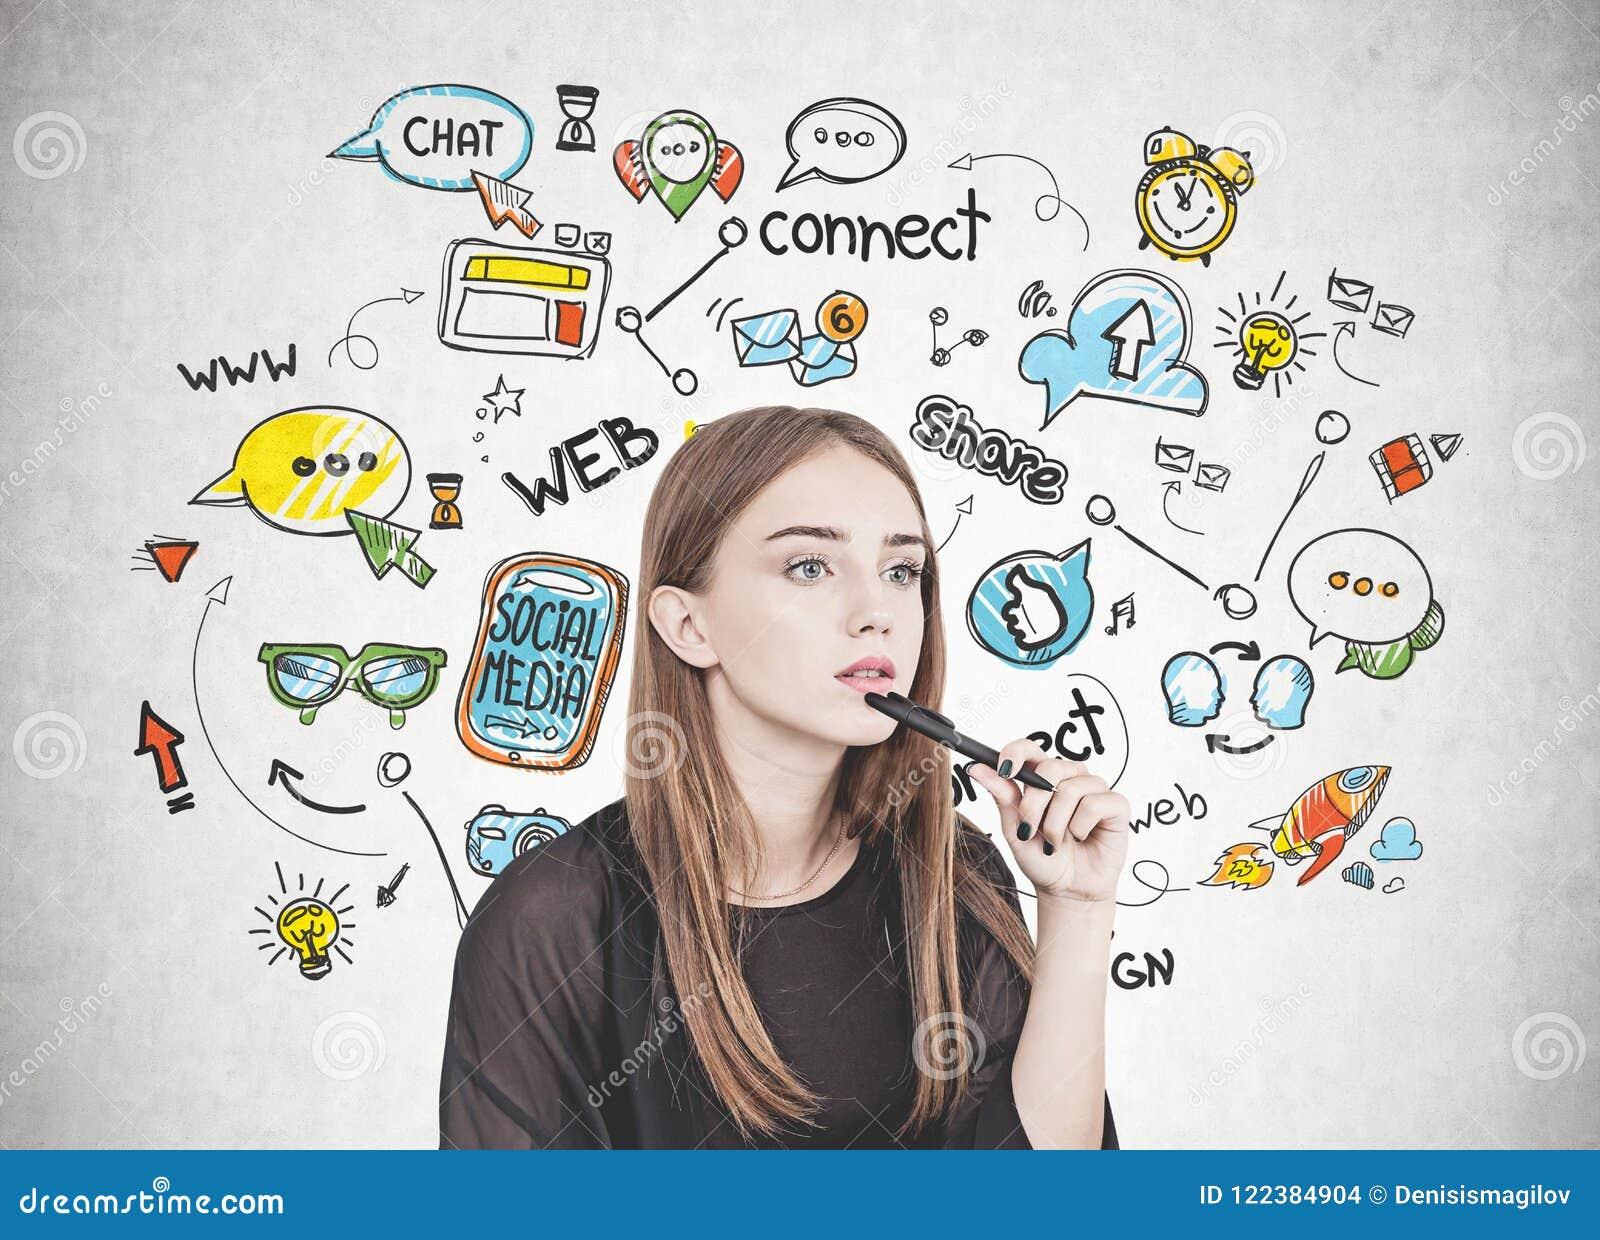 Giovane donna pensierosa con la penna, media sociali